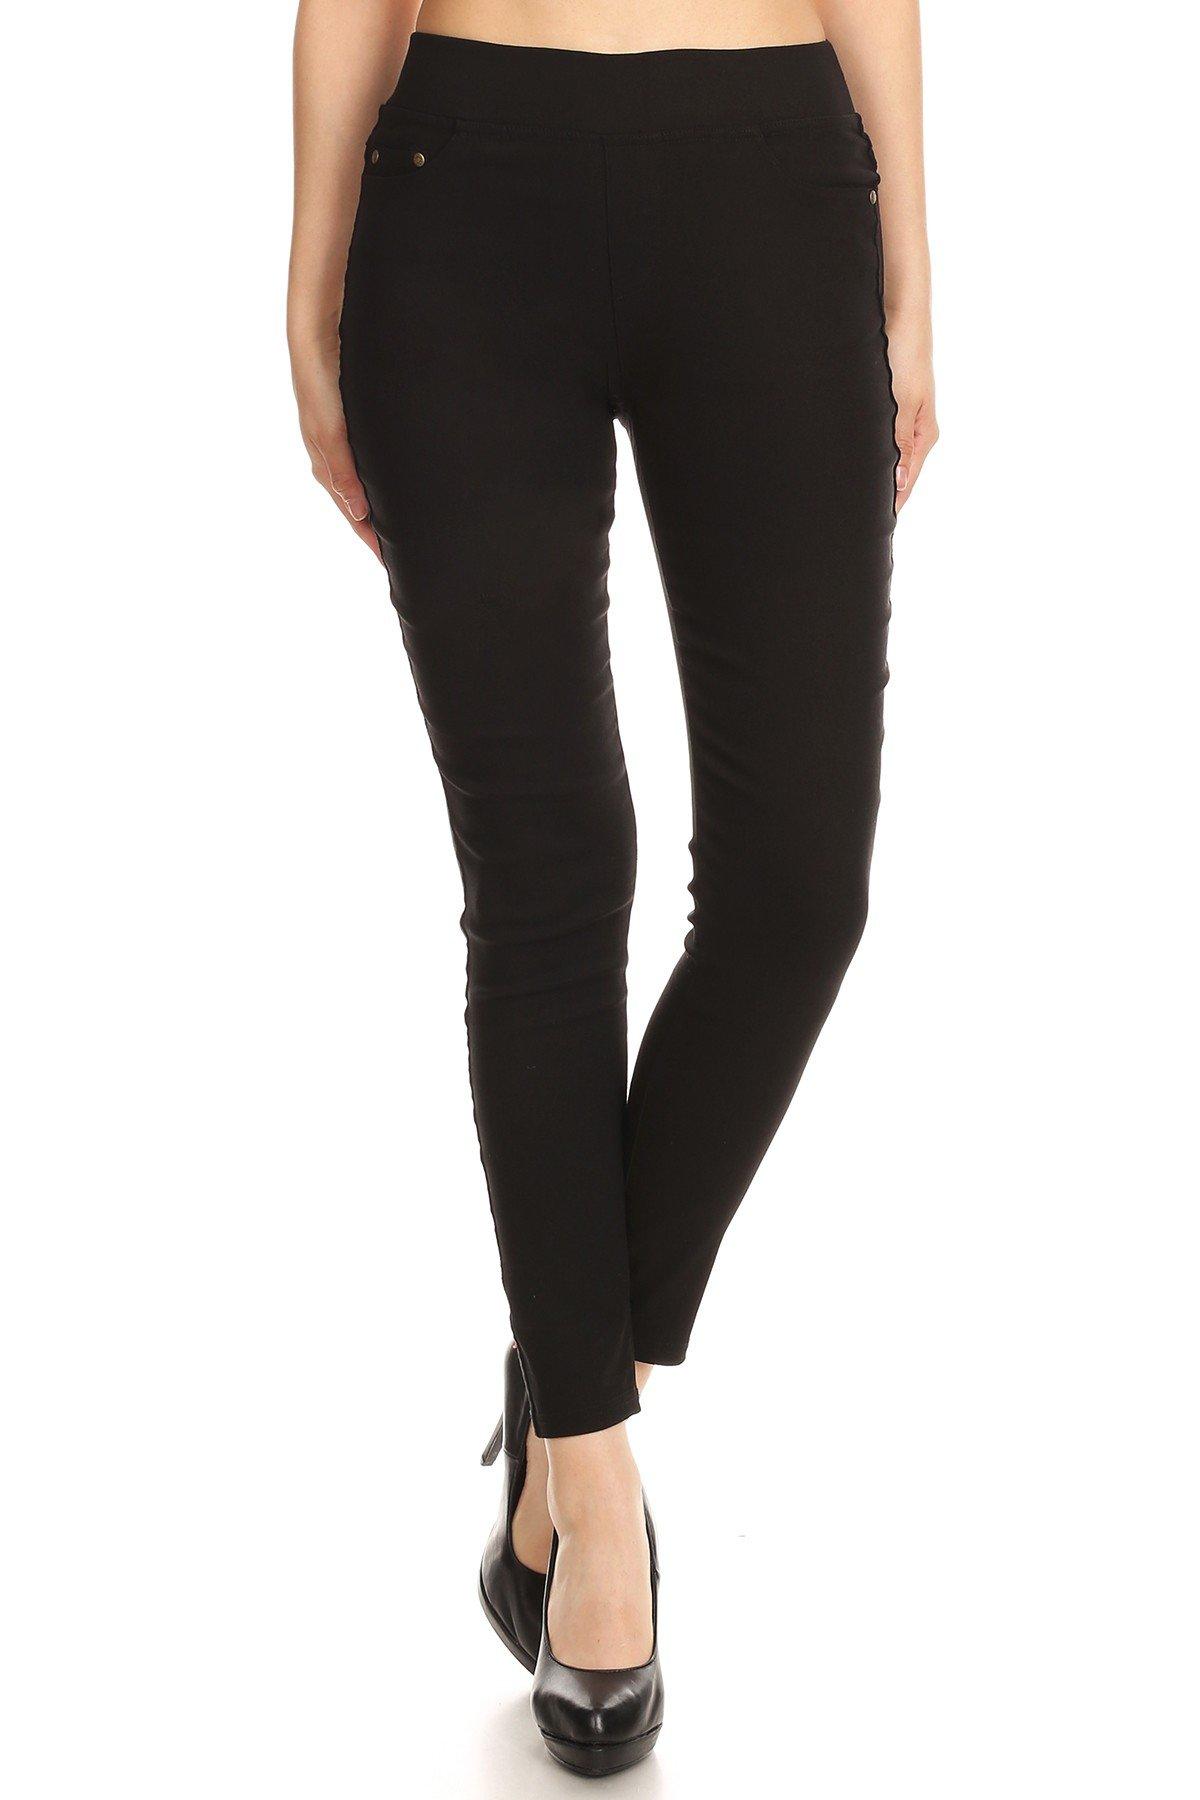 MissMissy Women's Casual Color Denim Slim Fit Skinny Elastic Waist Band Spandex Jeggings Ankle Jeans Pants (Large, Black)